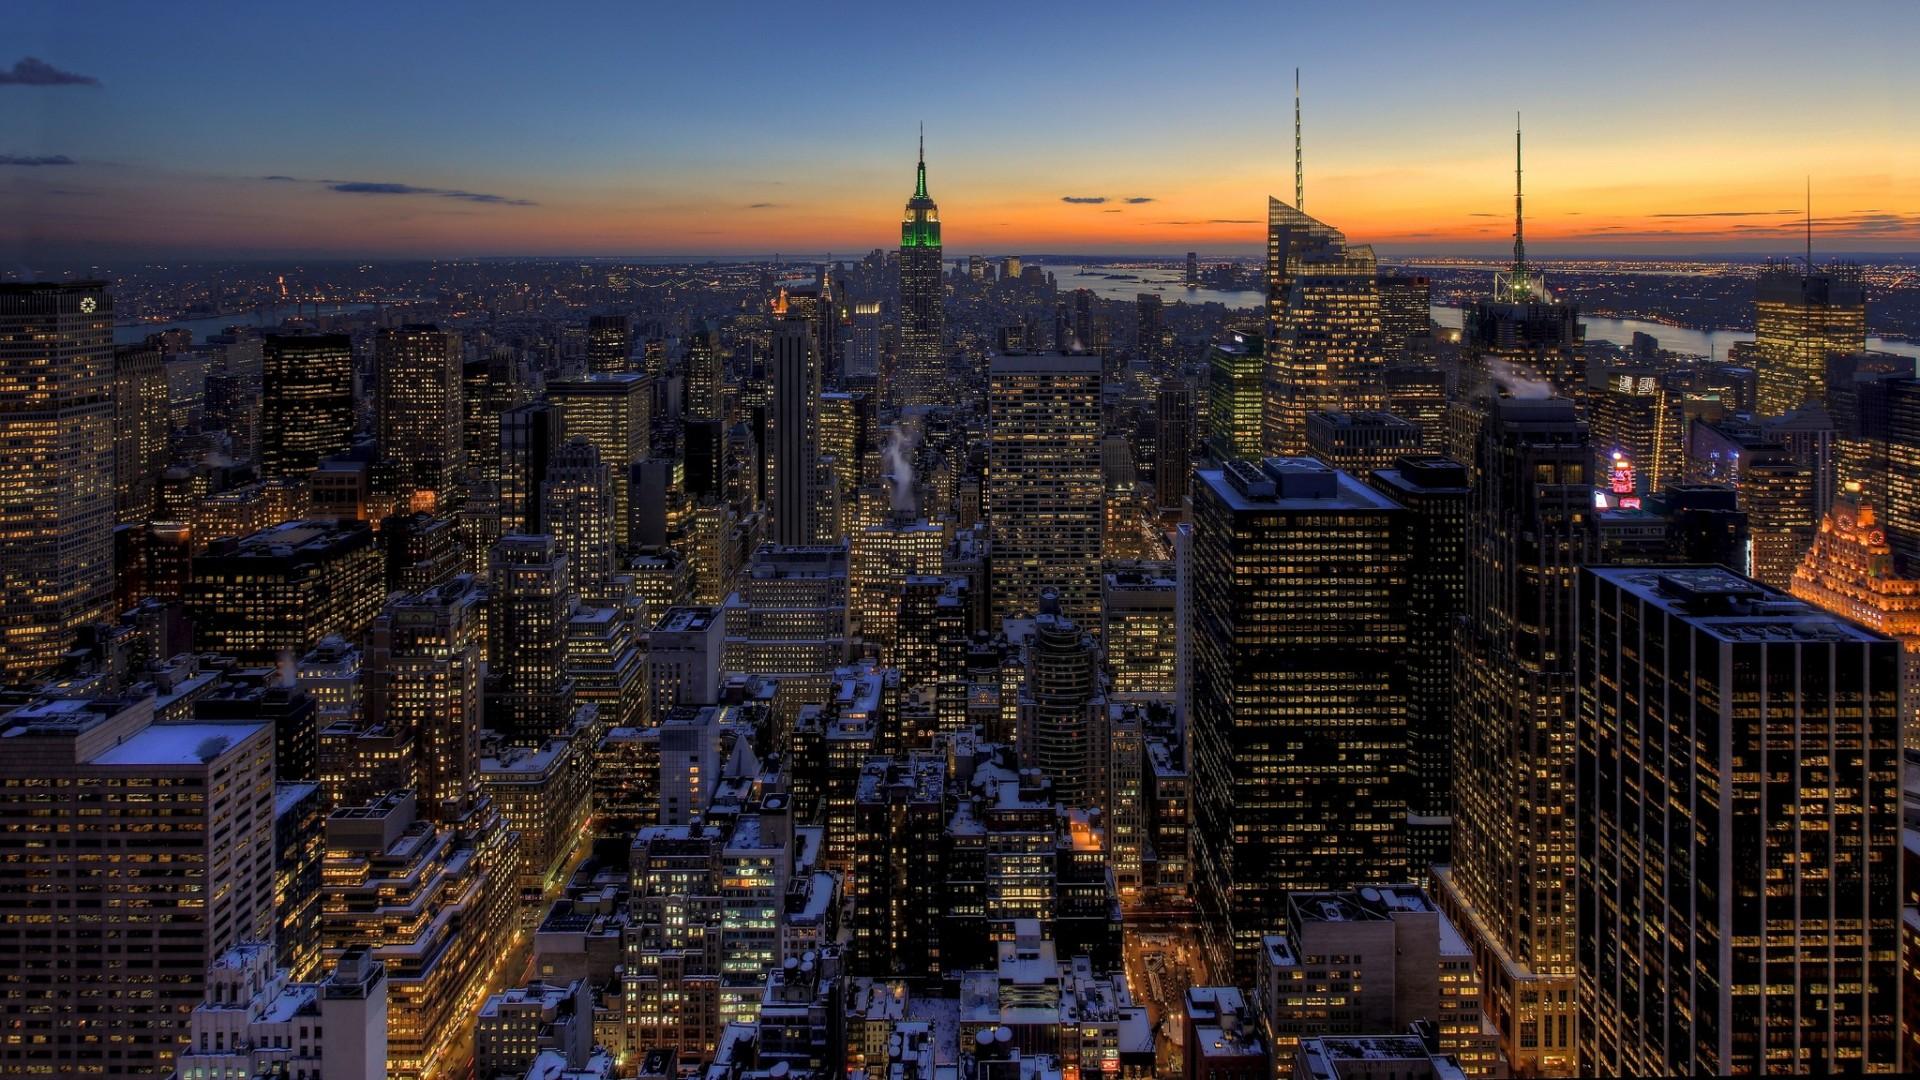 NY Skyline Wallpapers And Screensavers